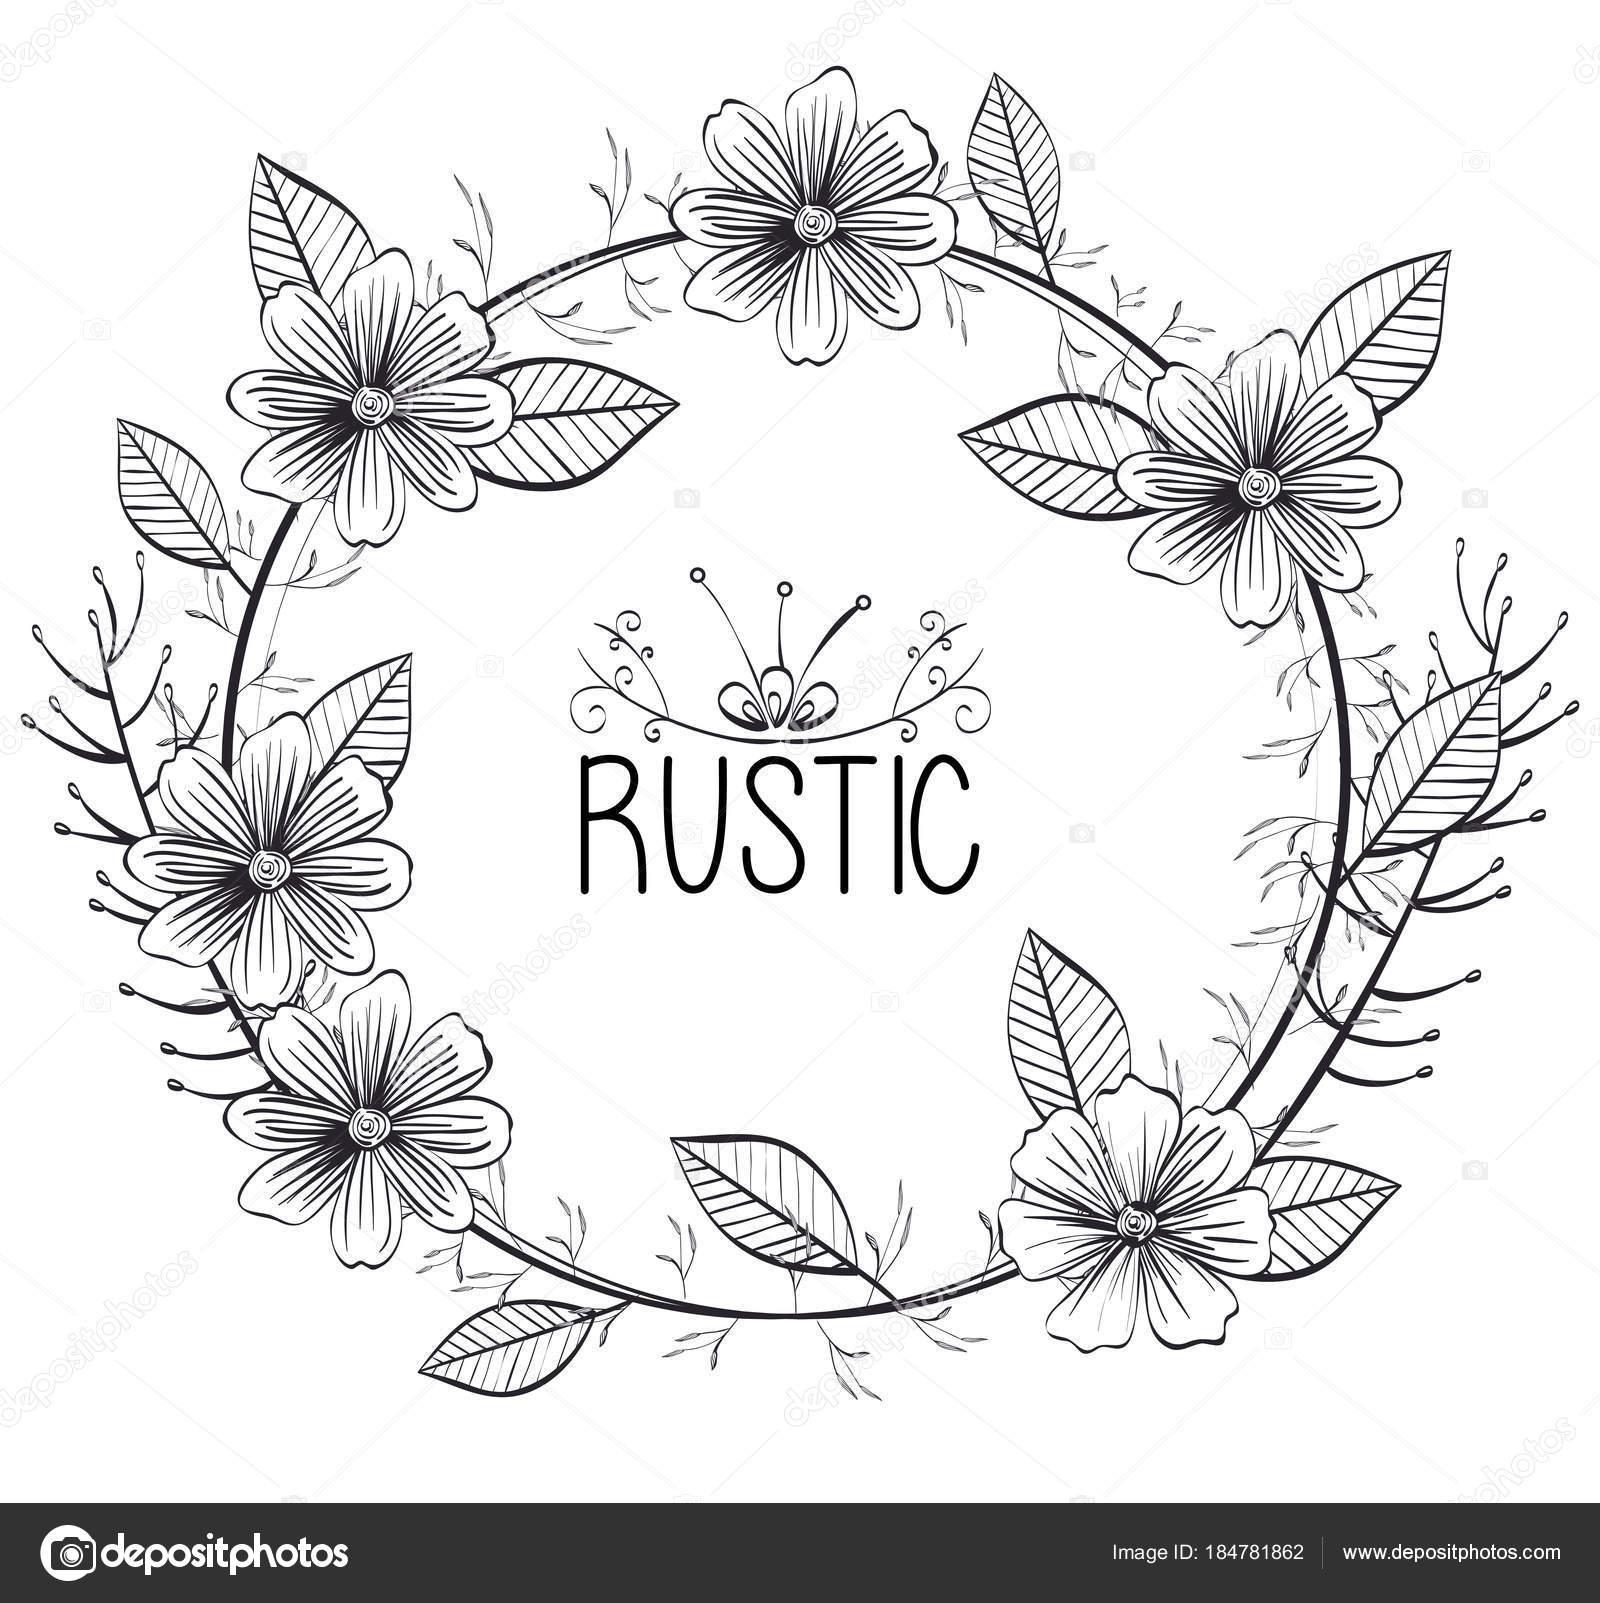 Rustic Circular Seal Wreath Vector Illustration Design By Yupiramos